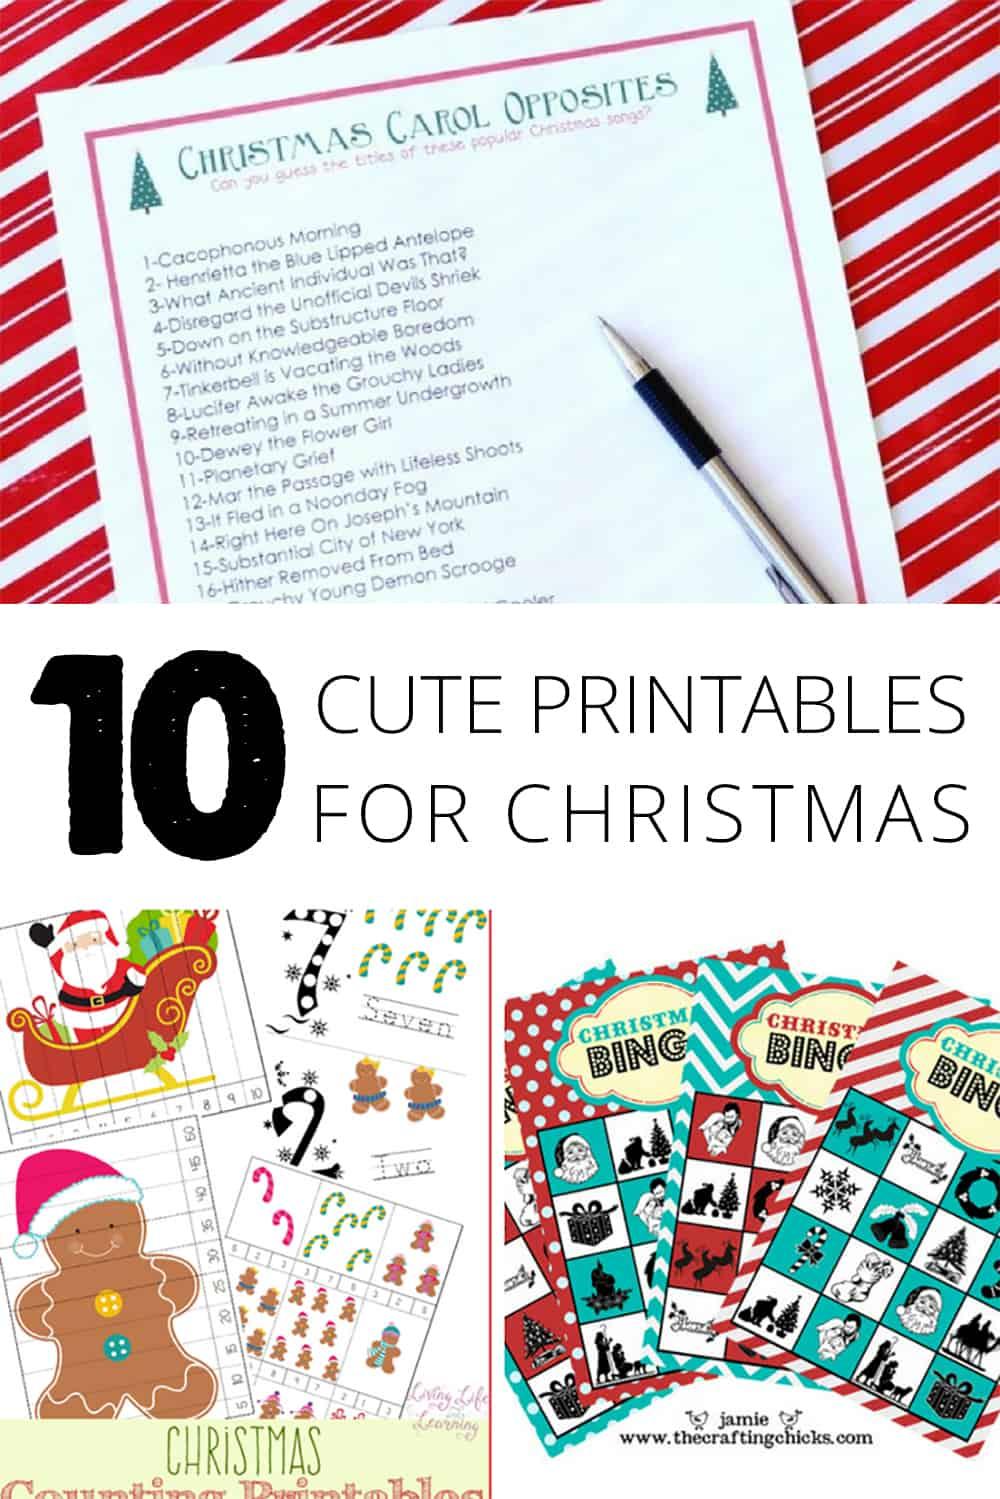 10 Cute Printables for Christmas